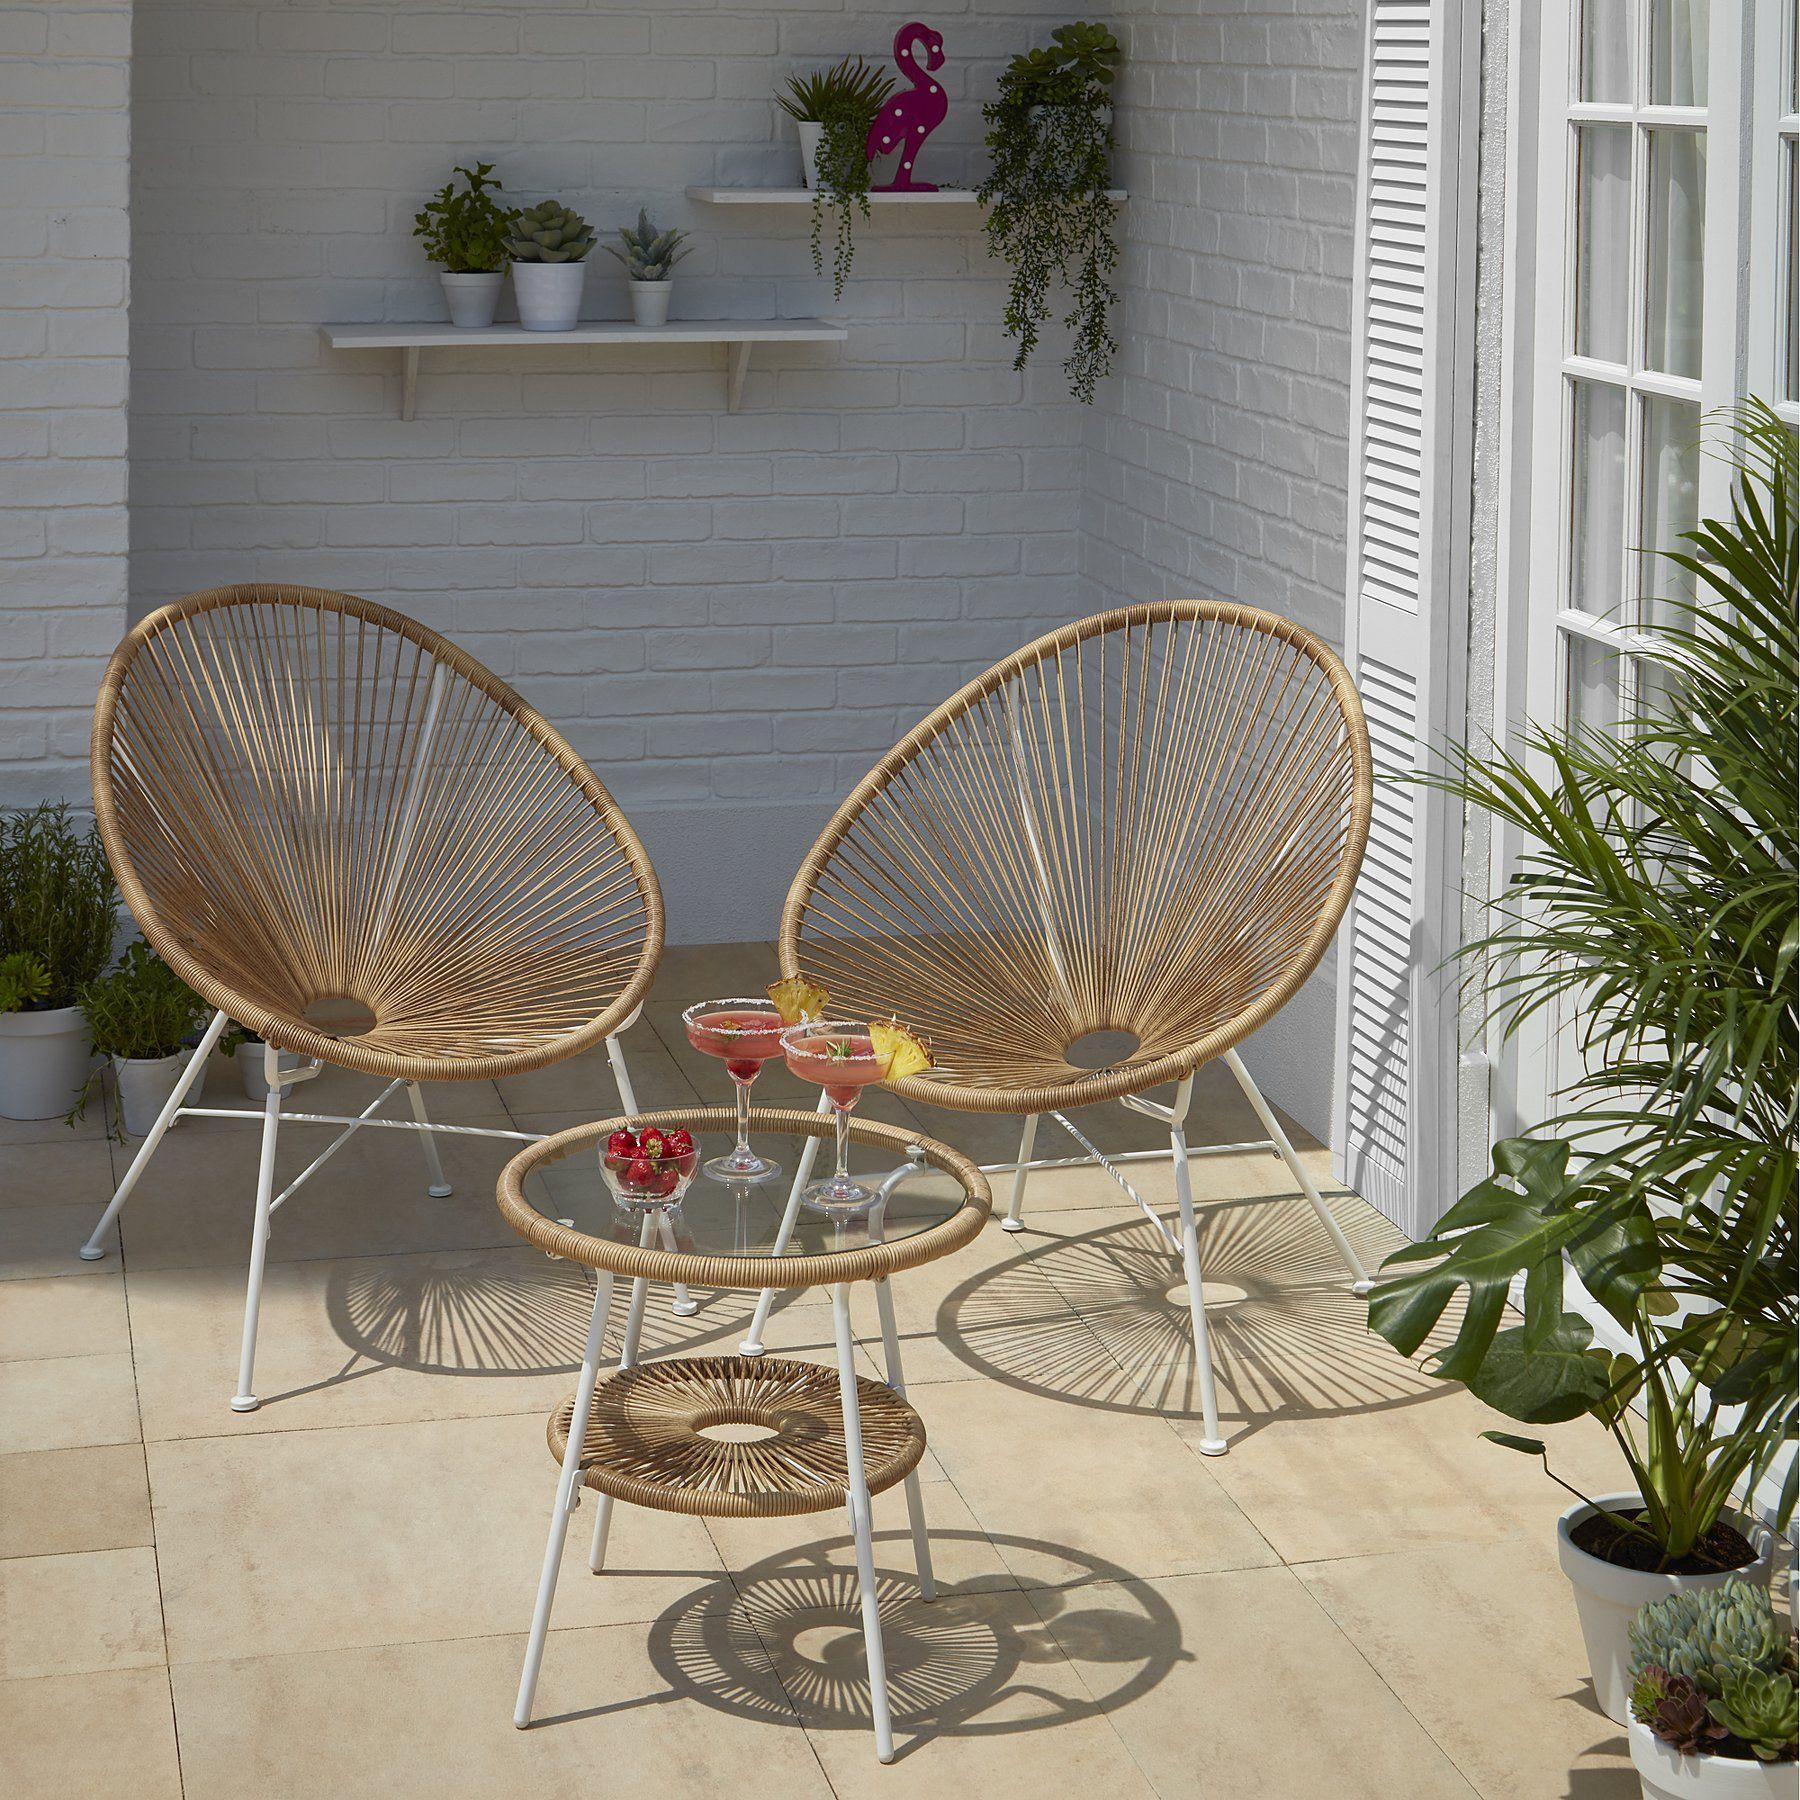 Camden 3 Piece Bistro Set Natural Home Garden George Bistro Set Dining Chairs Diy Inside Plants Decor